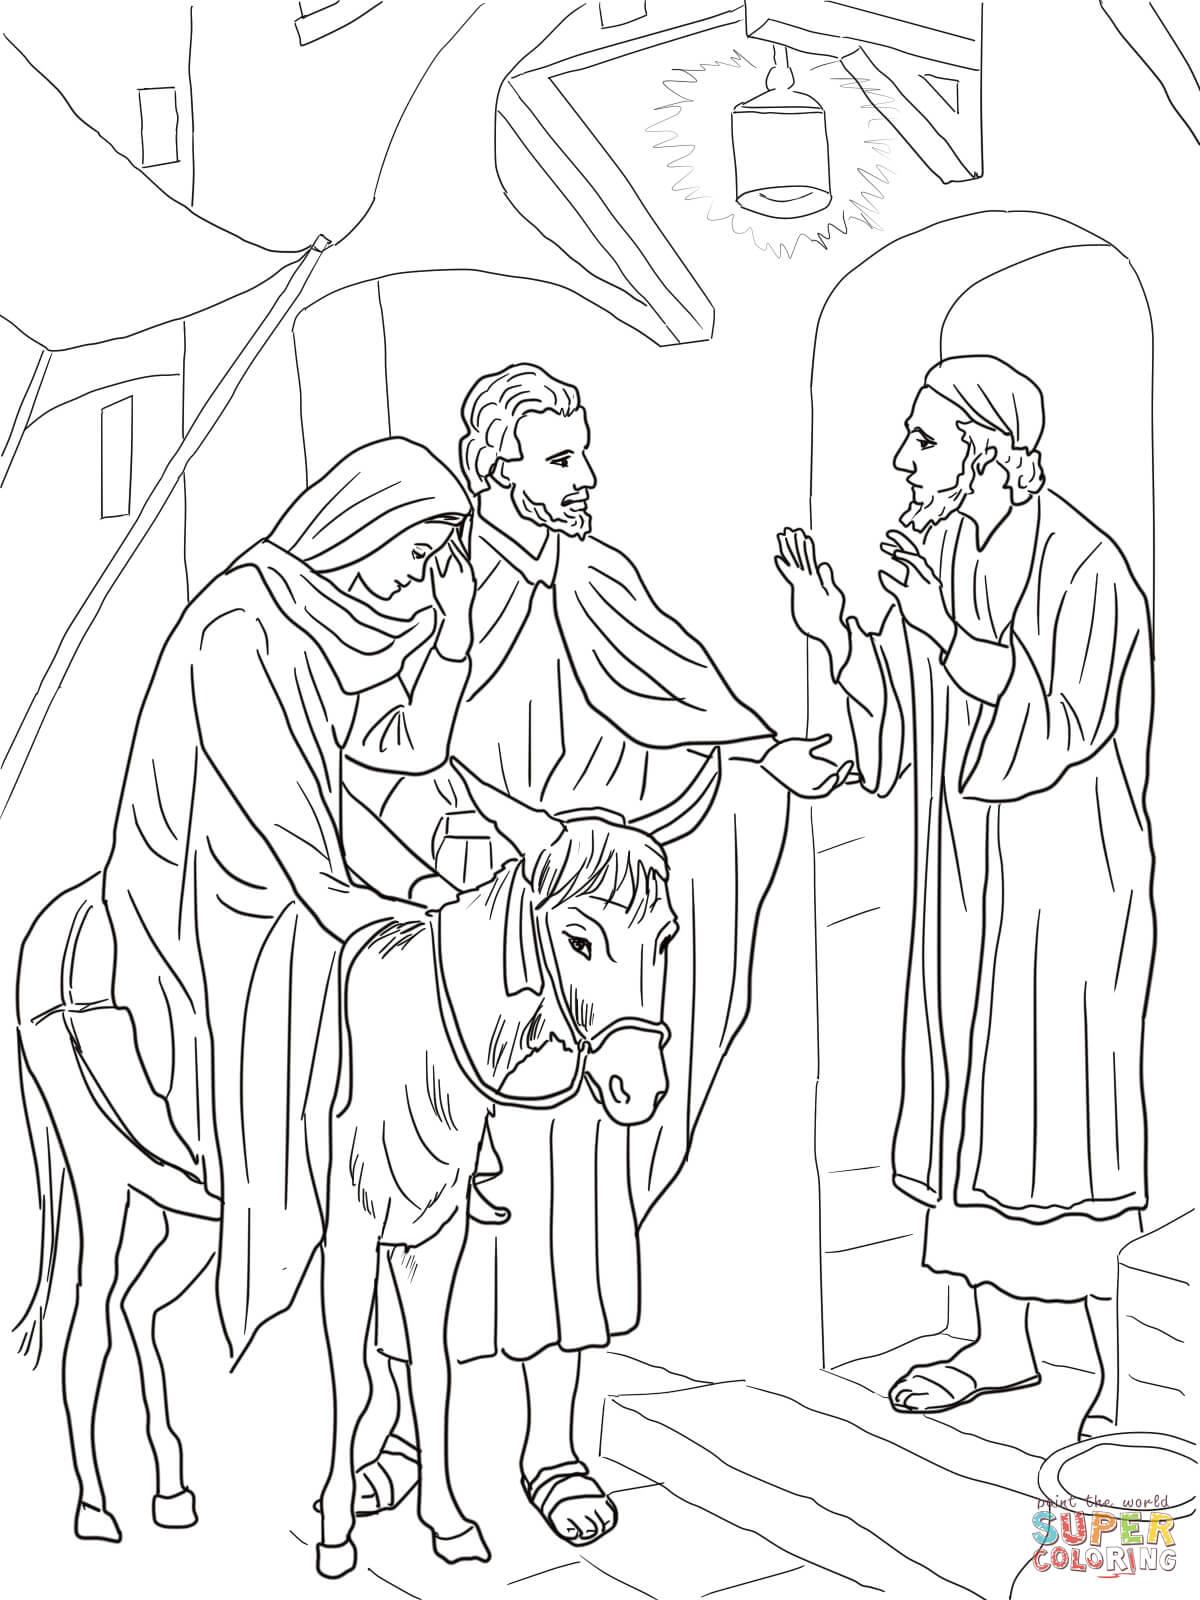 Happy Saints: Journey to Bethlehem Coloring Page | 1600x1200